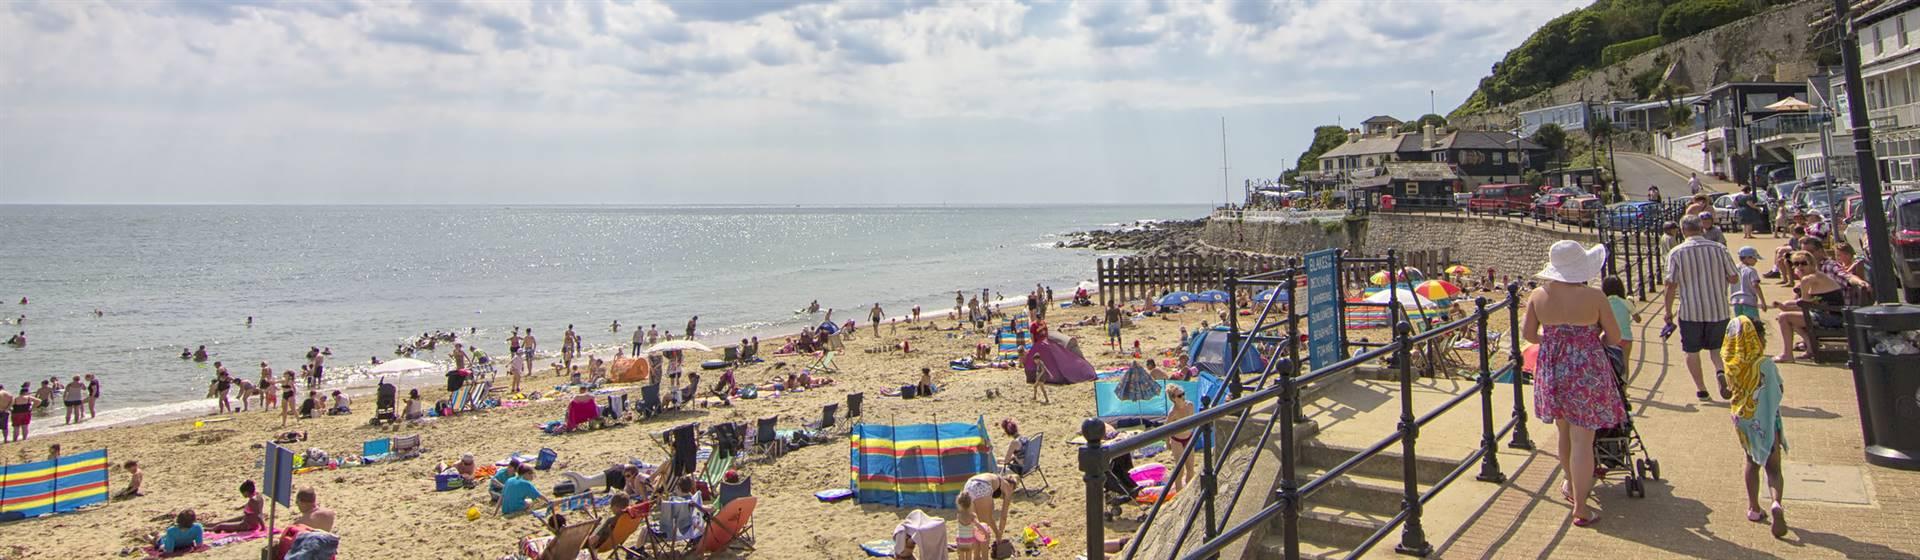 Ventnor Beach - visitisleofwight.co.uk